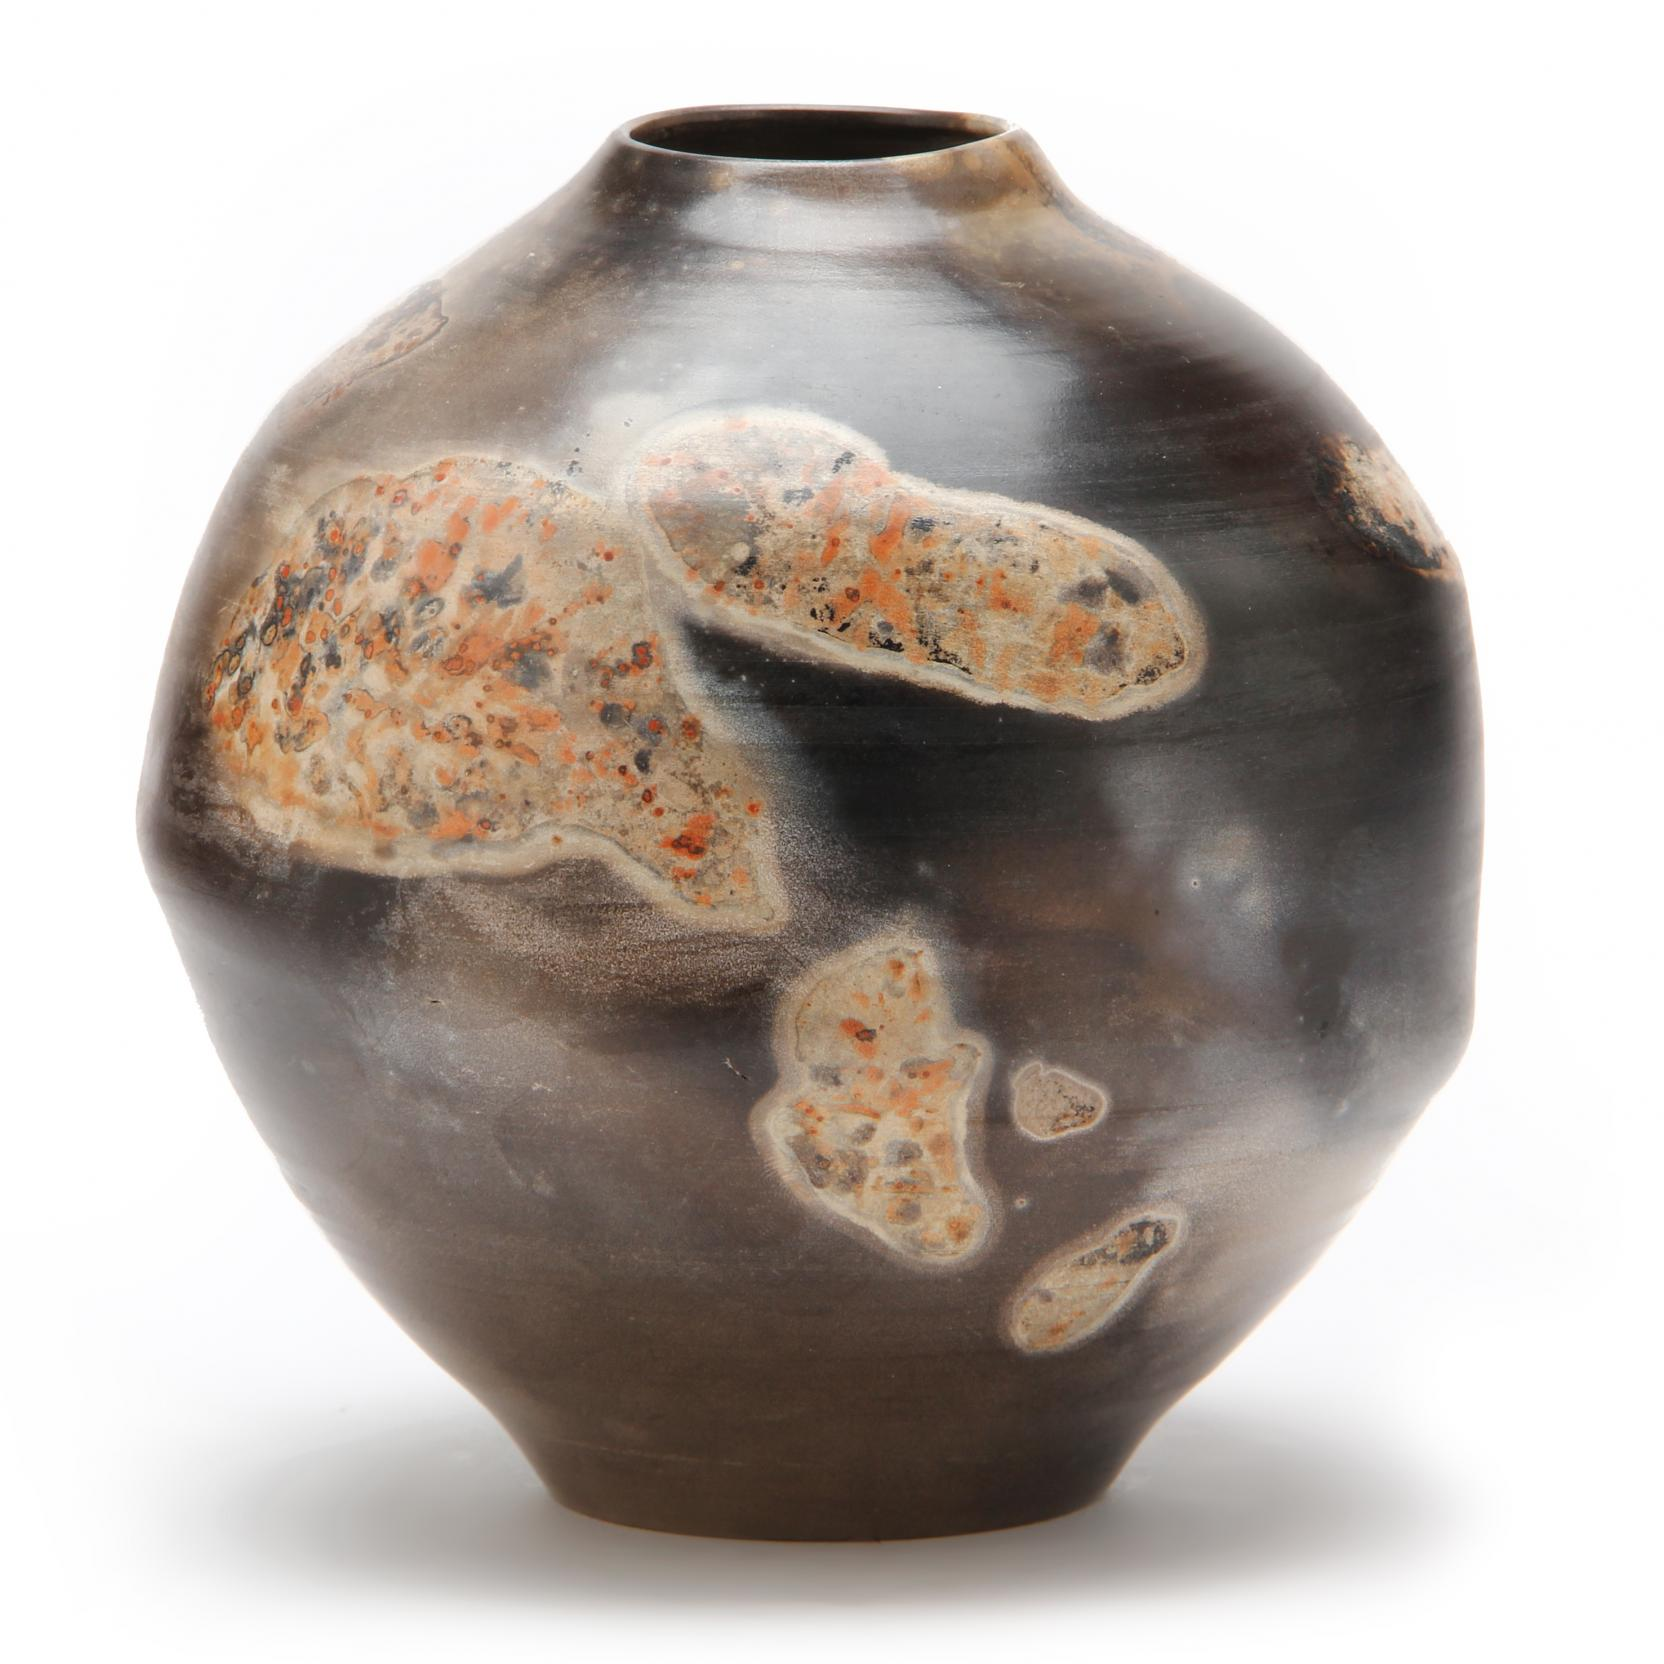 nc-pottery-edge-barnes-seaweed-pot